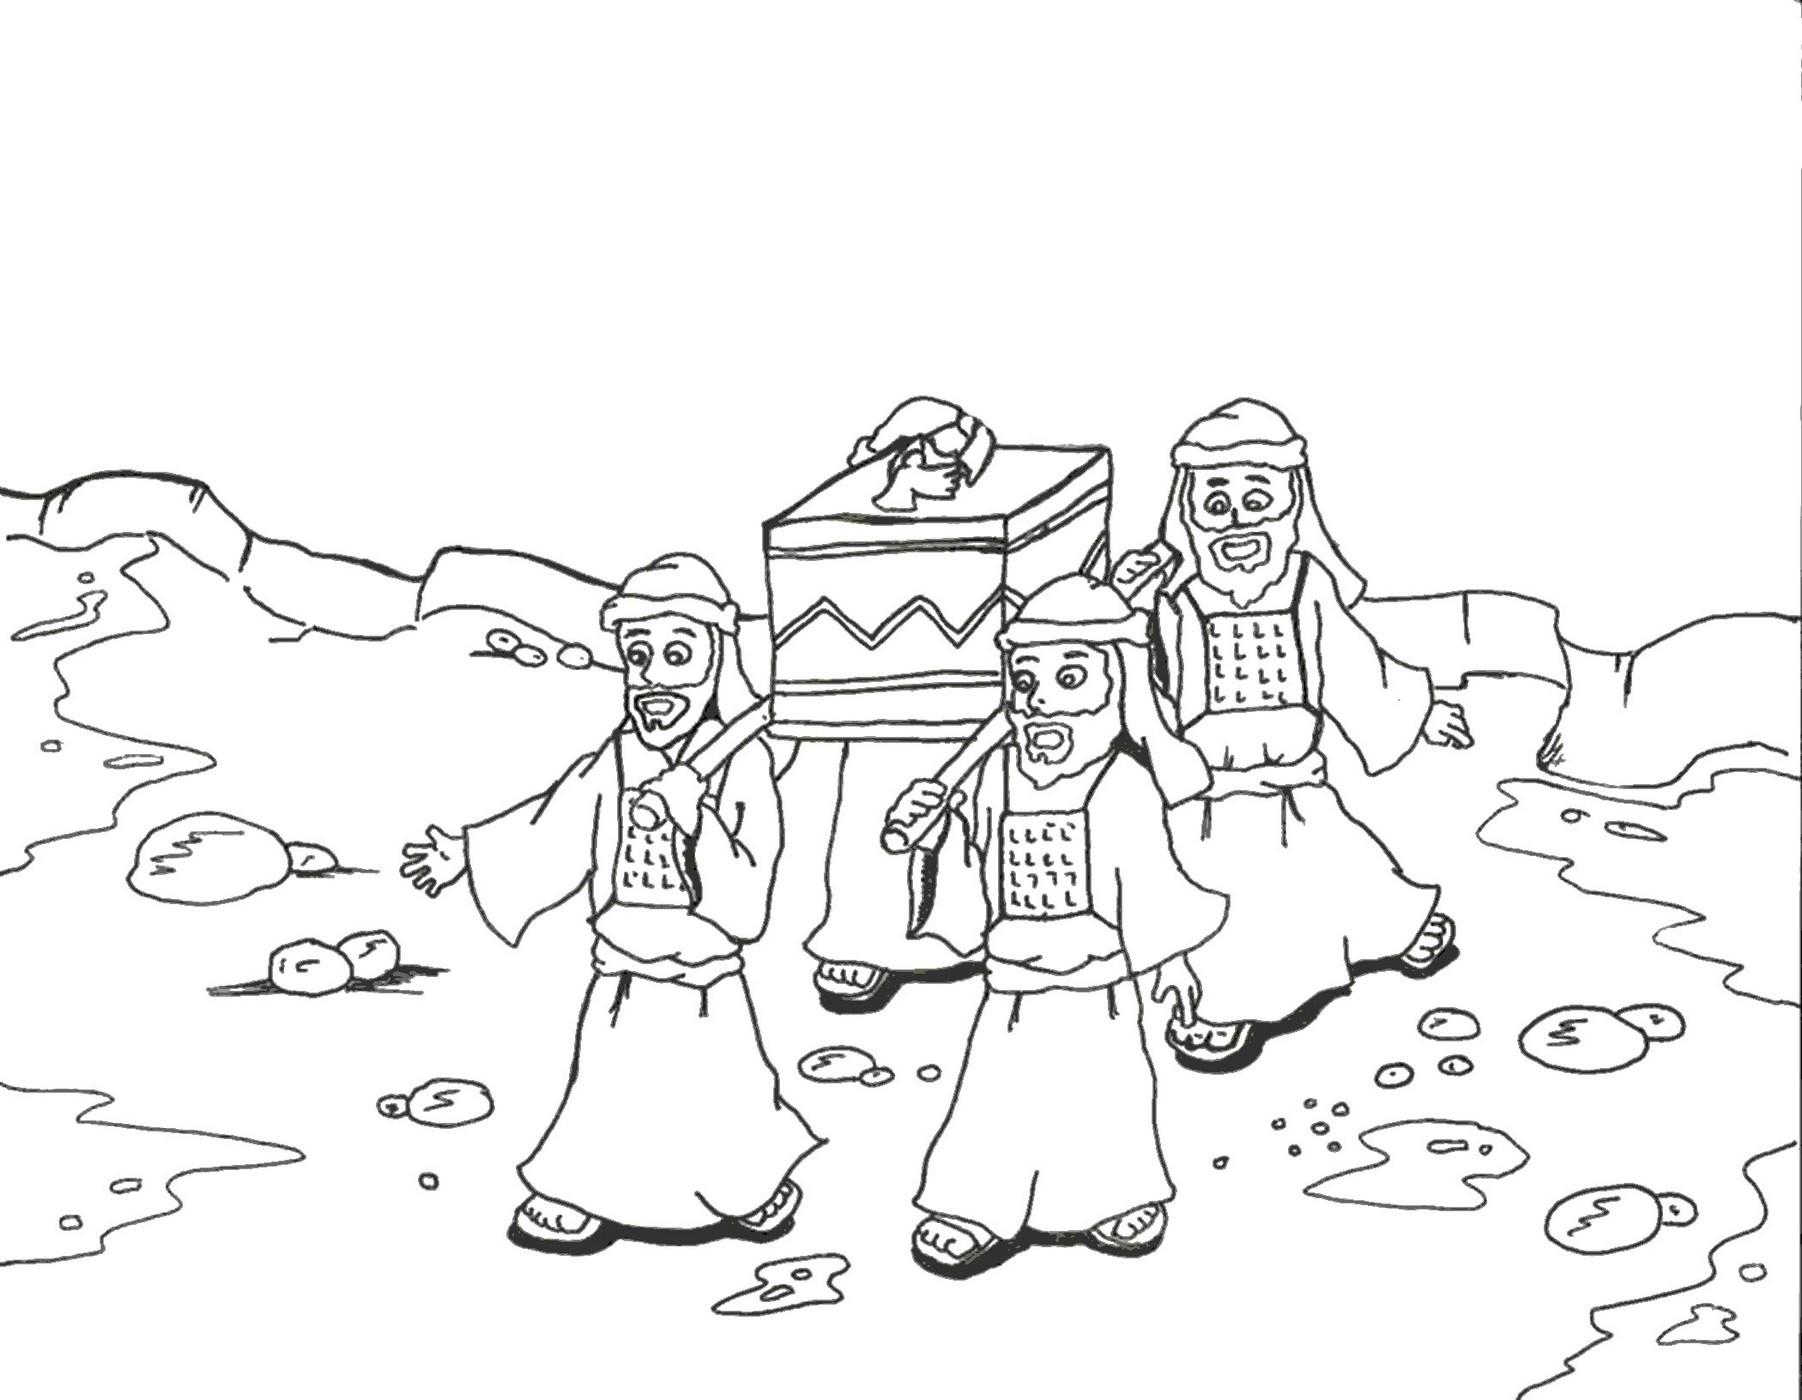 Coloring Page Of Israelites Crossing The Jordan River